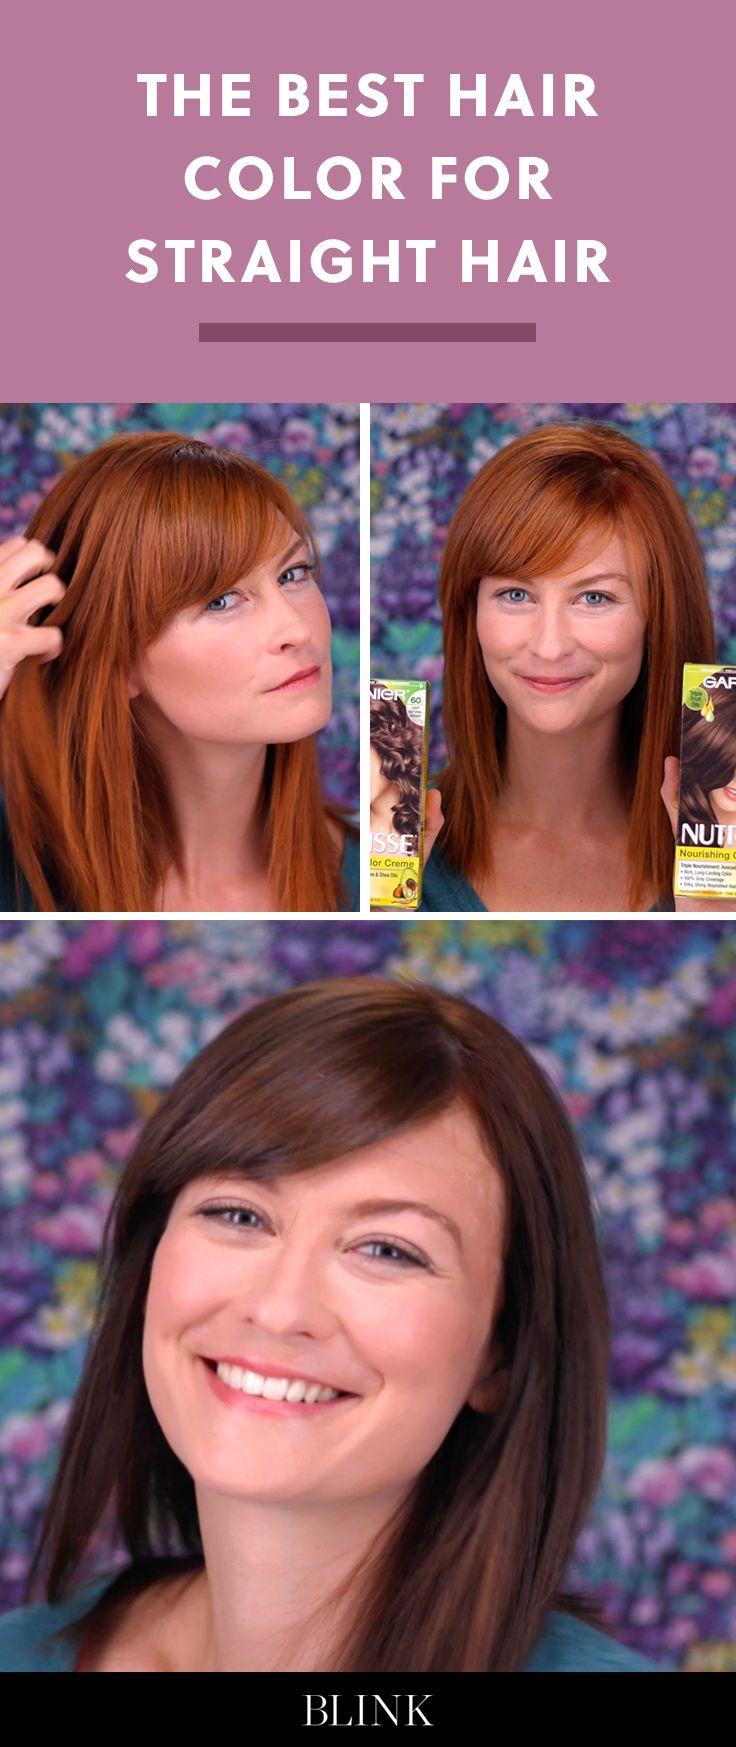 27 Best Hair Color Ideas Images On Pinterest Dip Dye Novo Lipstik Two Tone Lip Bar Original 007 The For Straight Blinkbeauty Haircolor Hairtutorials